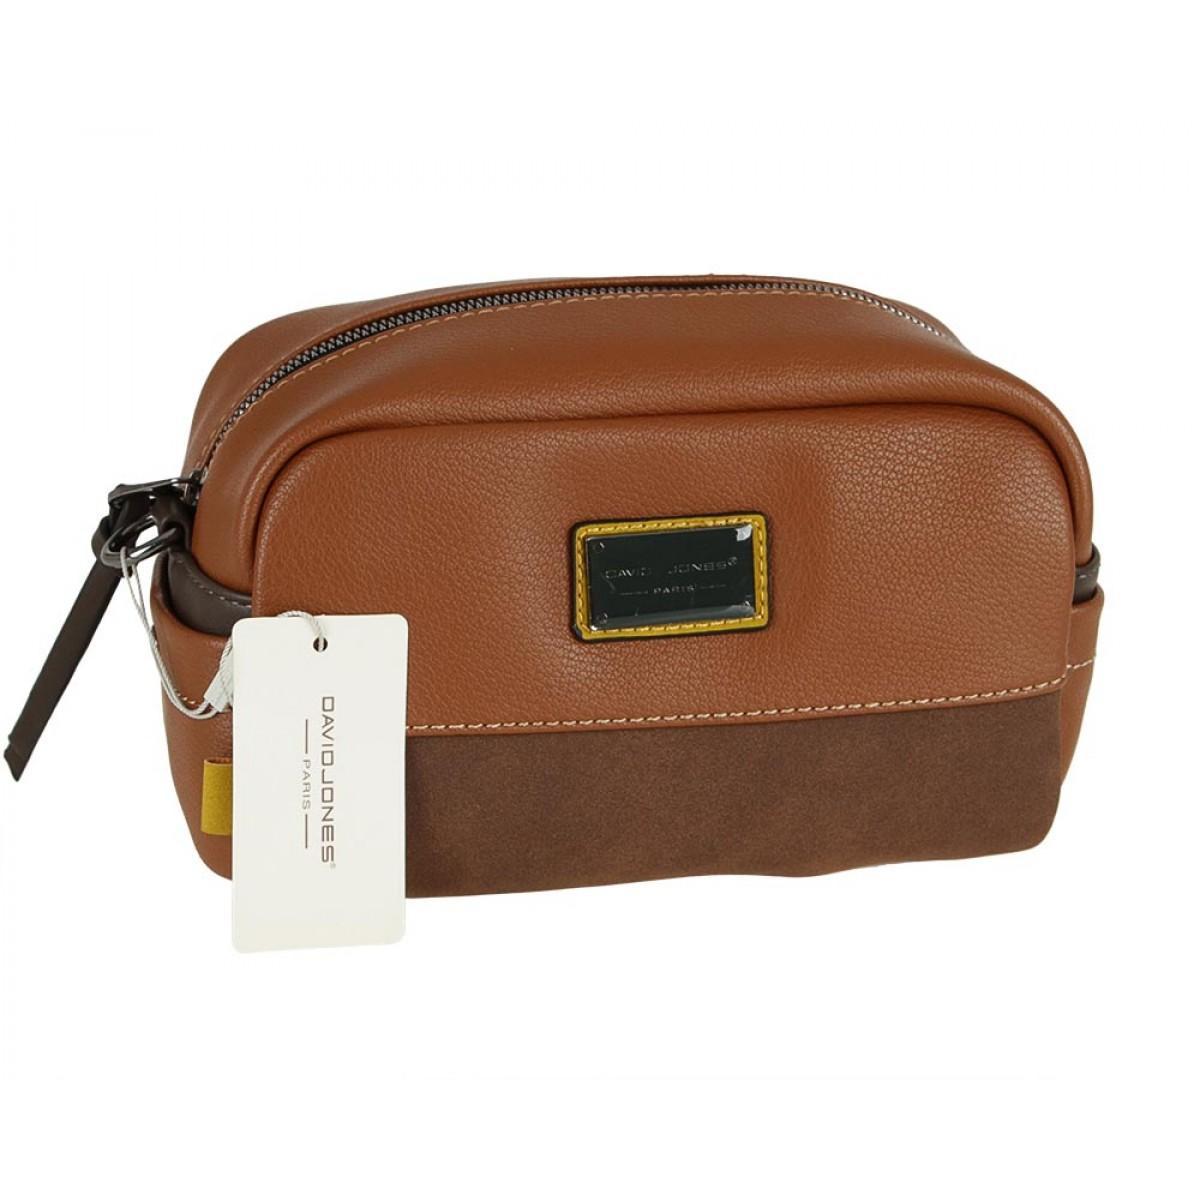 Жіноча сумка David Jones 6121-1 BROWN